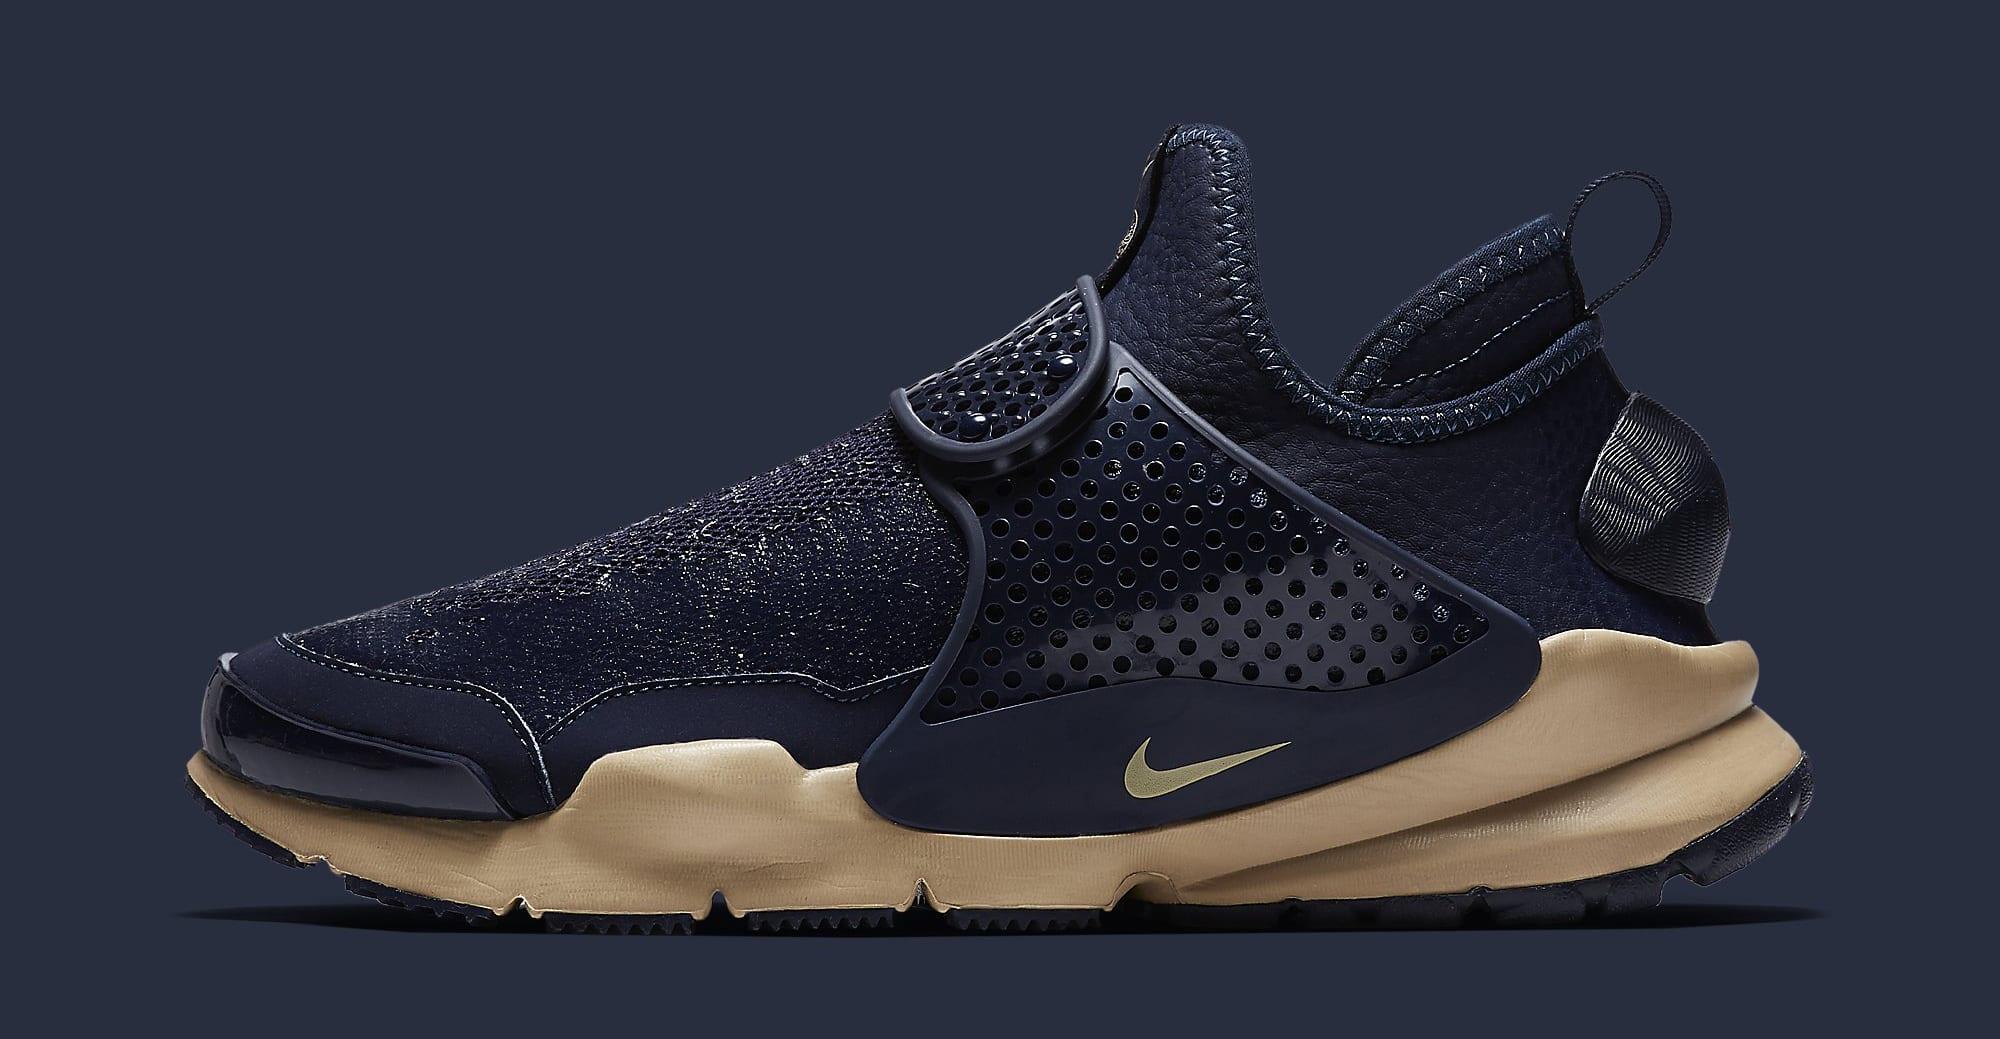 Stone Island Nike Sock Dart 910090-400 Profile